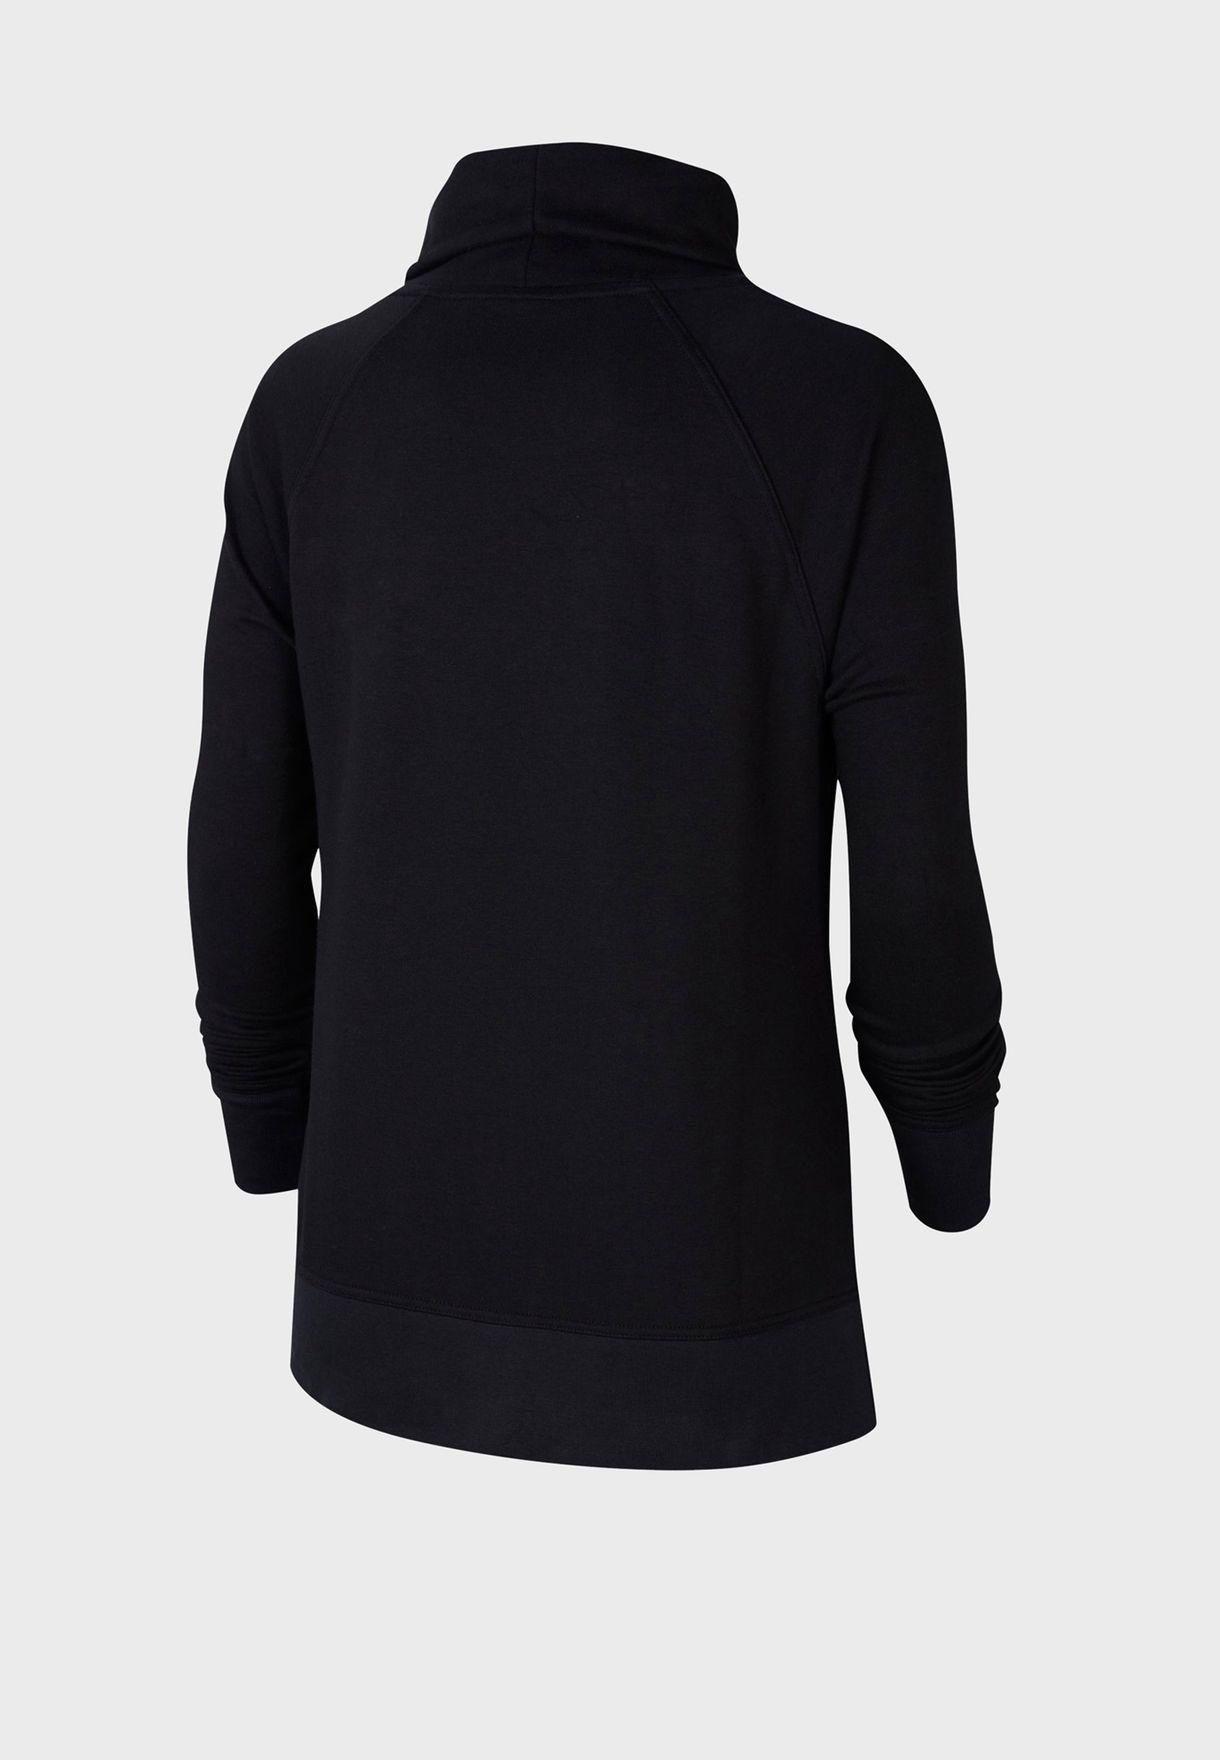 Dri-FIT Fleece Cowl Neck Sweatshirt